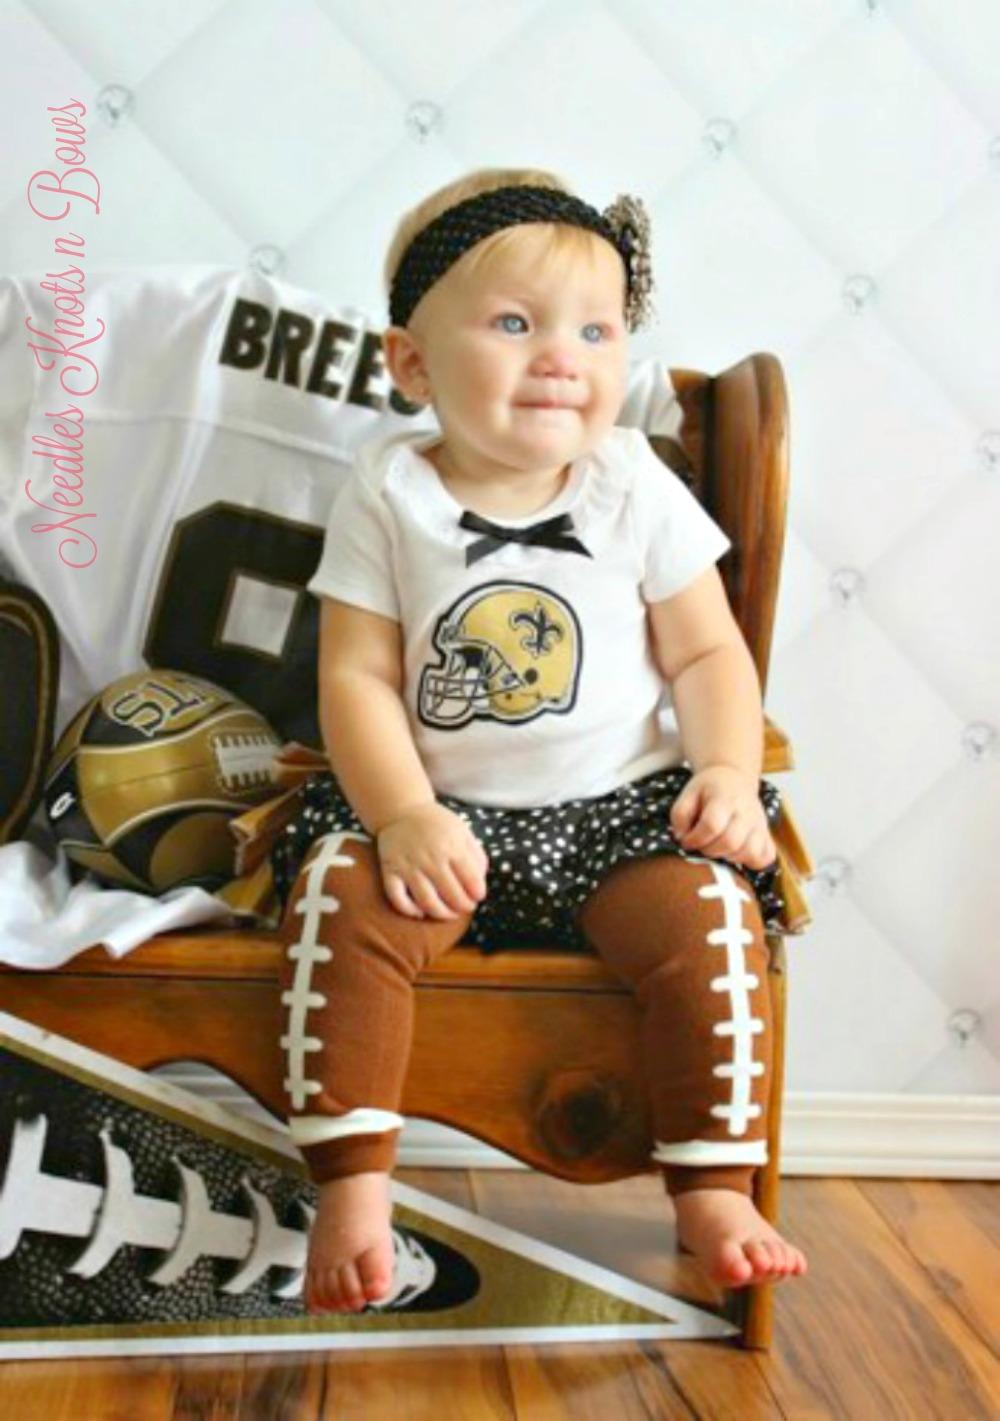 ... Girls Pittsburgh Steelers Cheerleader Outfit 66f4259af